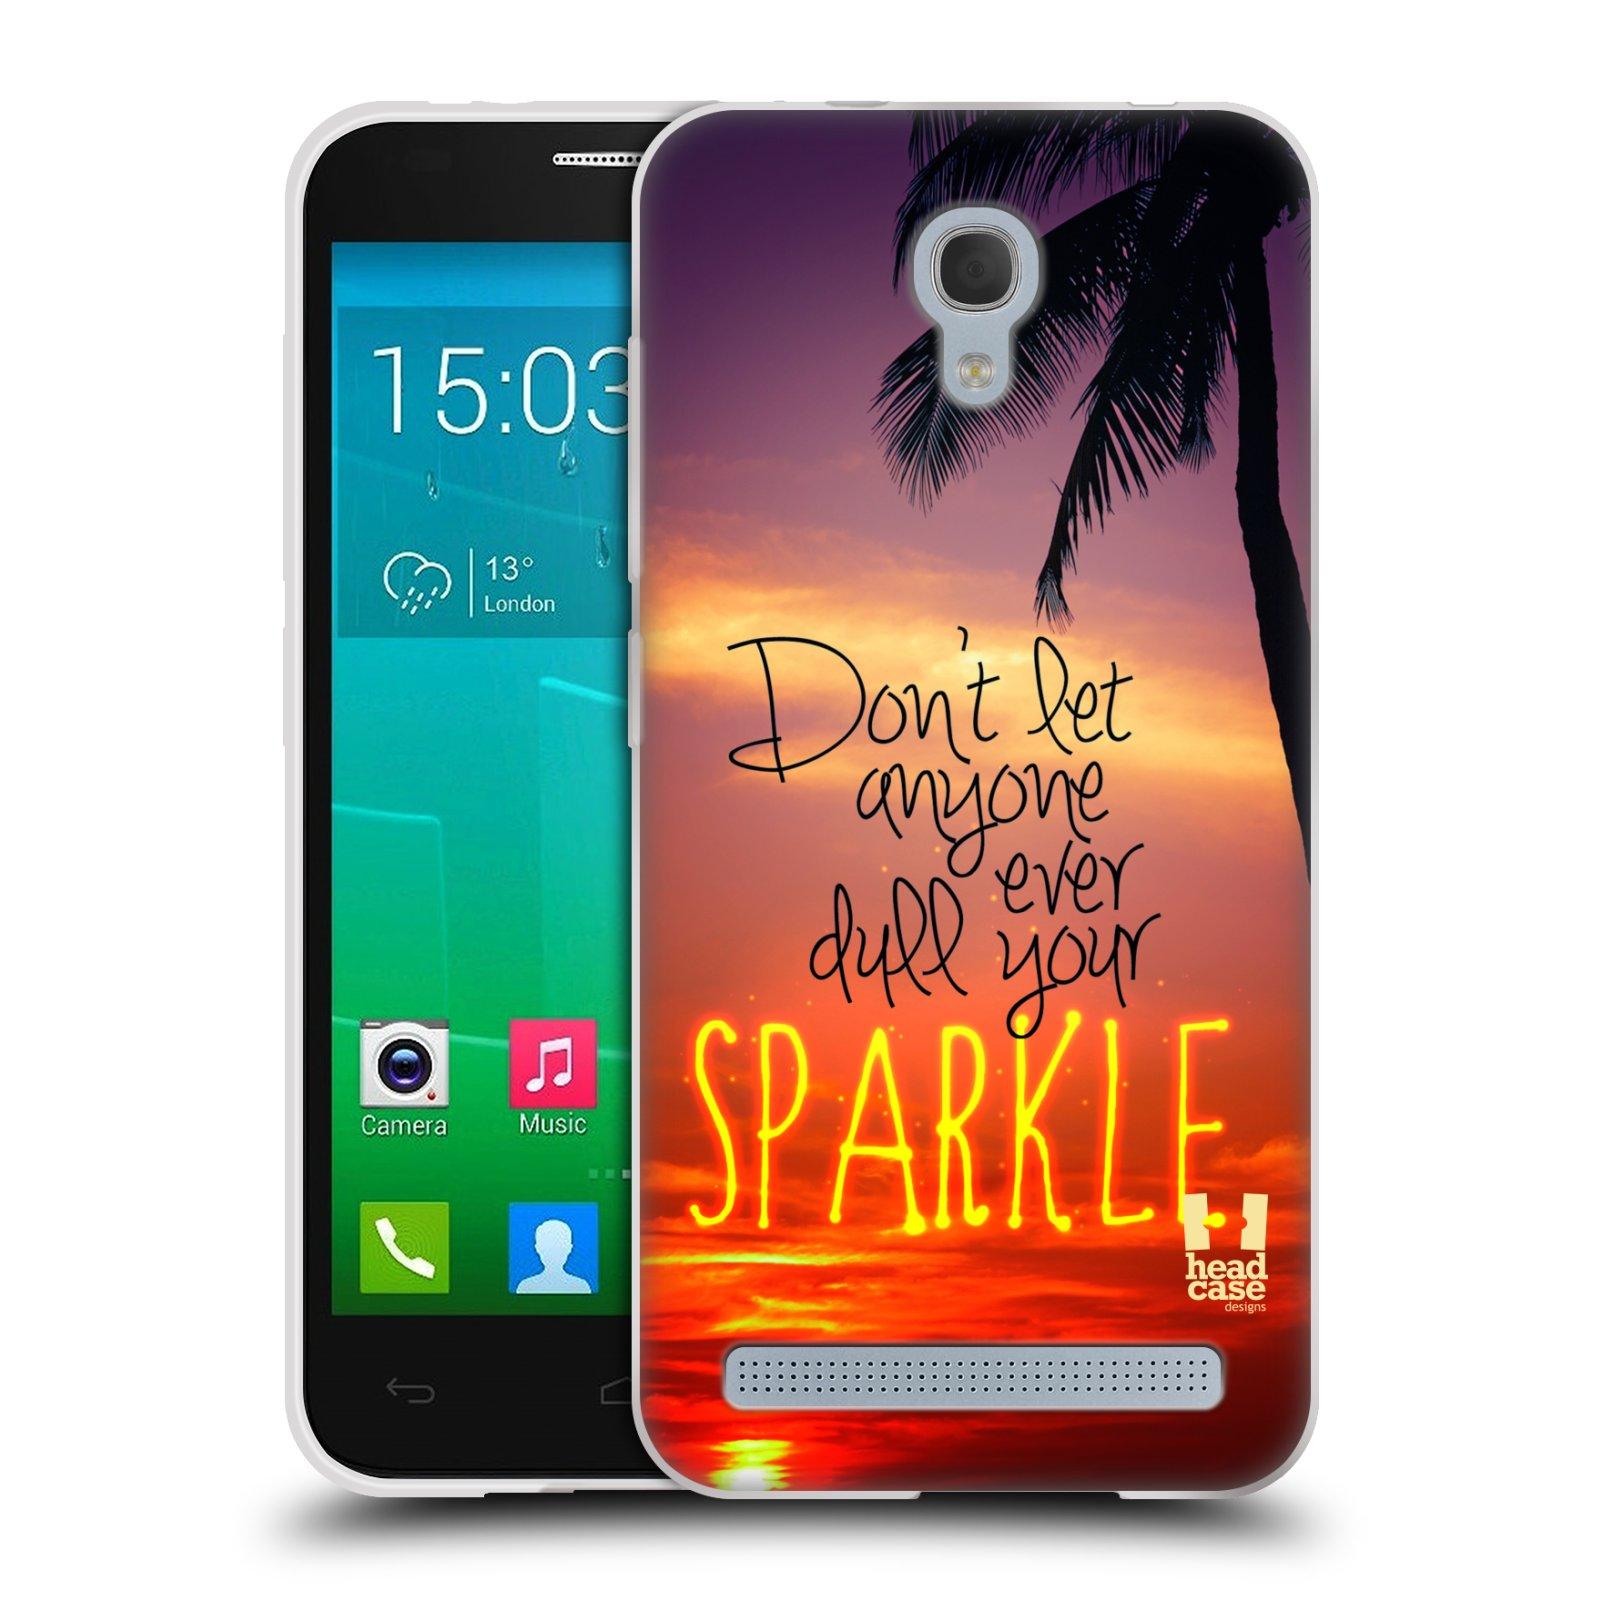 Silikonové pouzdro na mobil Alcatel One Touch Idol 2 Mini S 6036Y HEAD CASE SPARKLE (Silikonový kryt či obal na mobilní telefon Alcatel Idol 2 Mini S OT-6036Y)